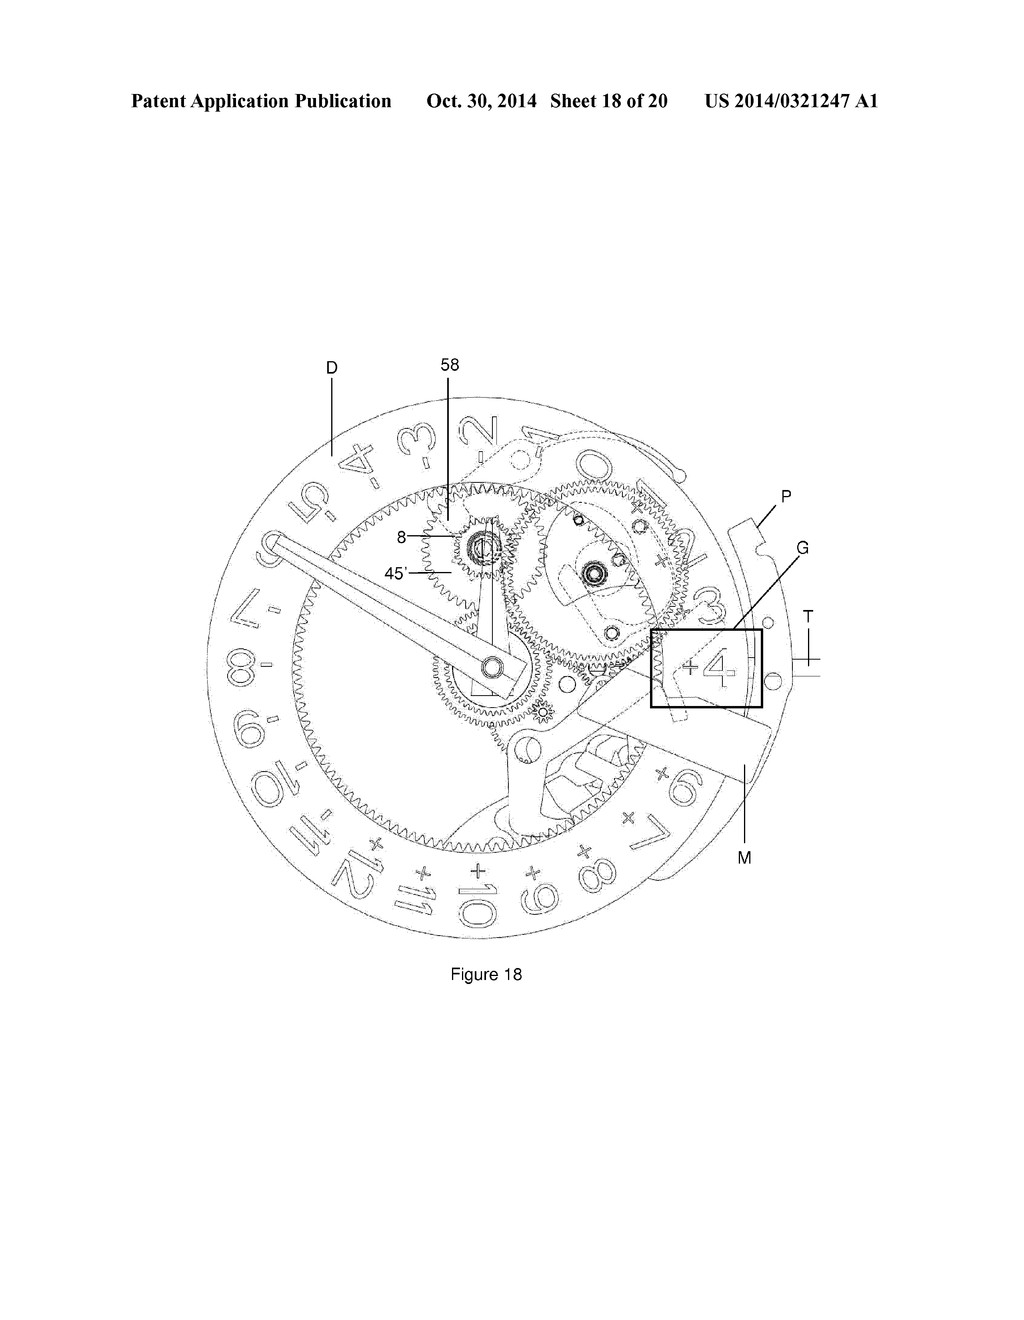 rolex-patent-2.jpg